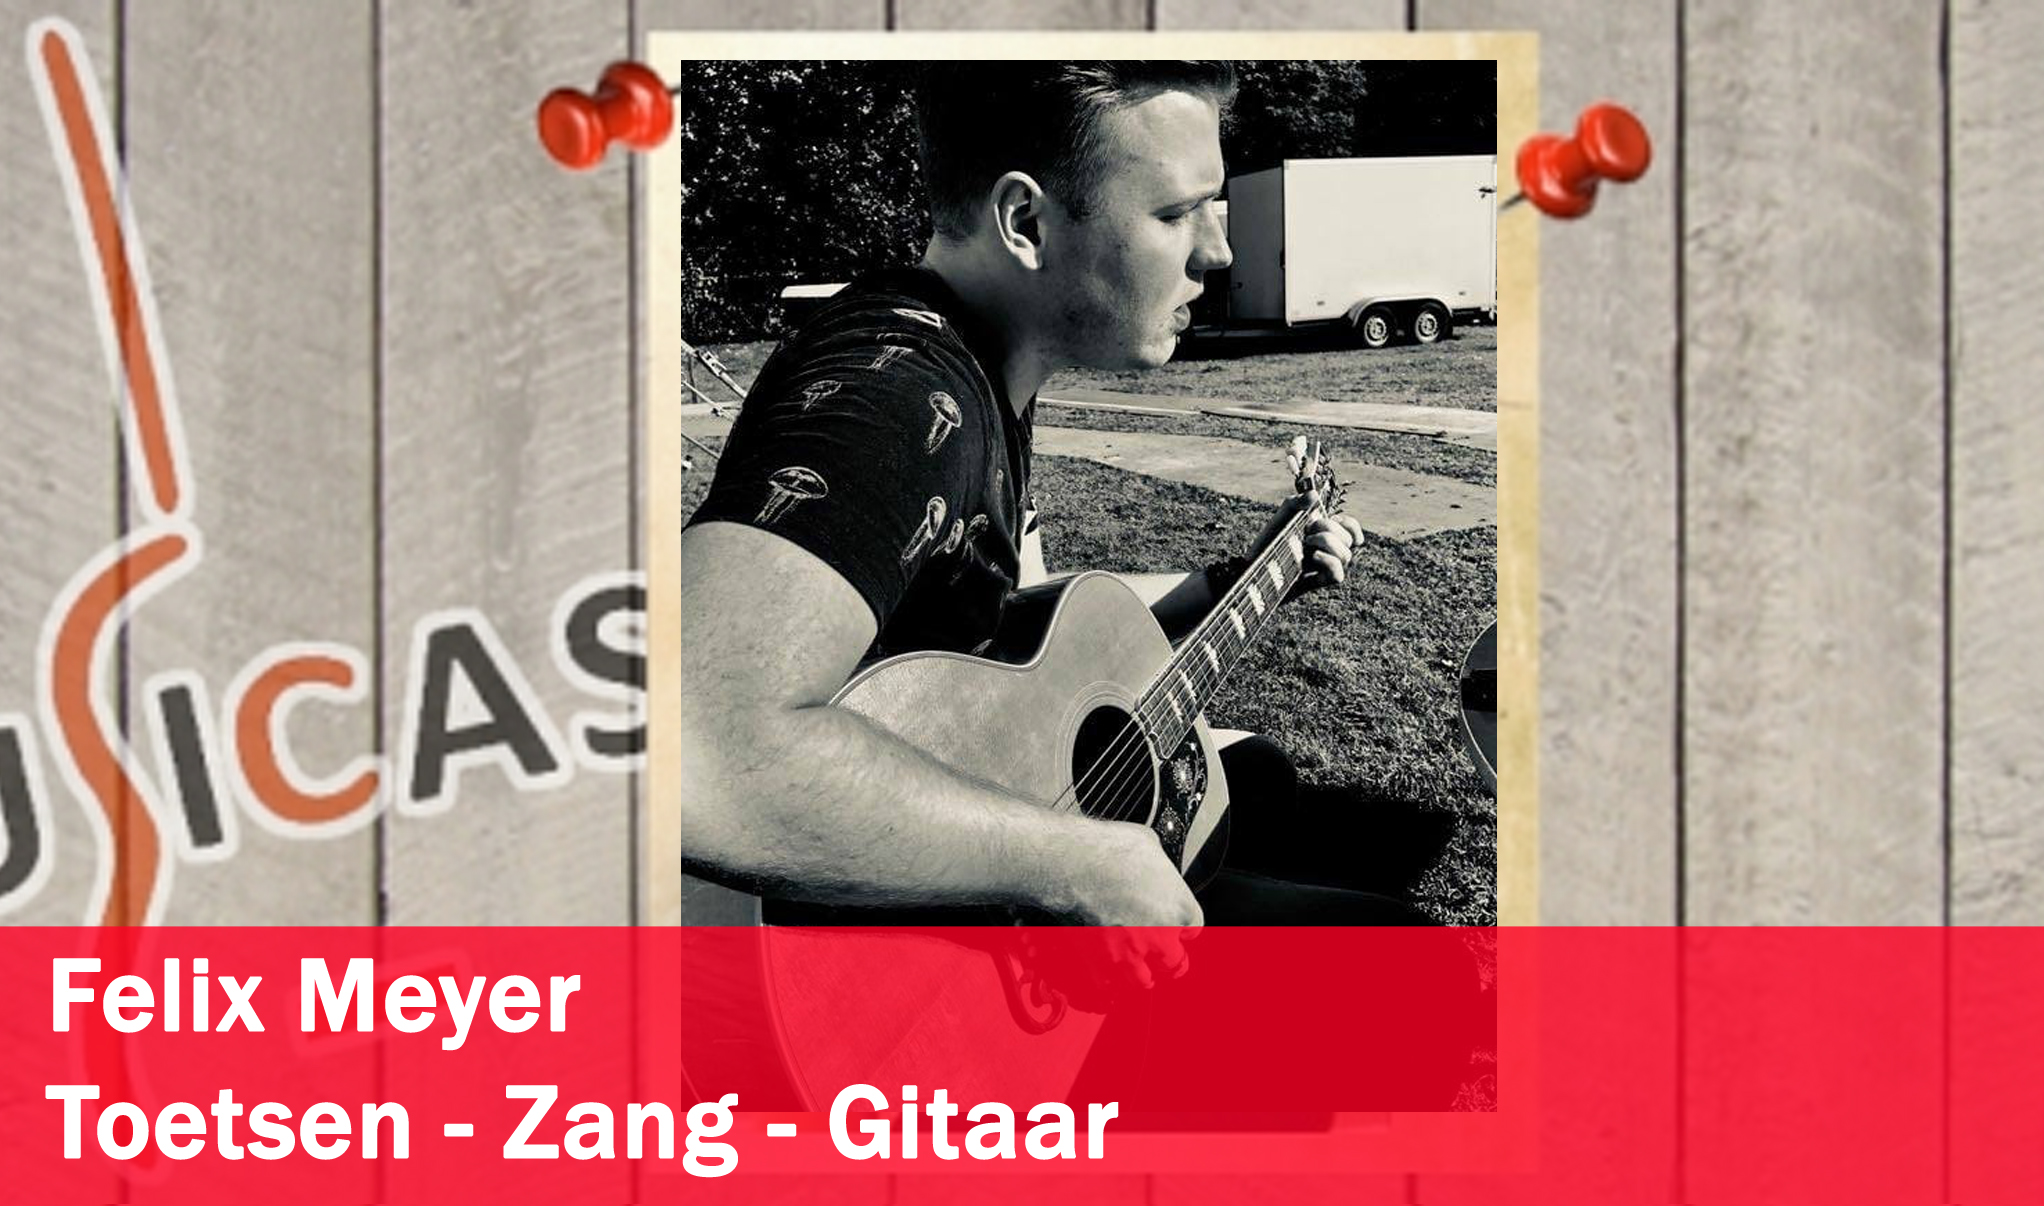 Felix Meyer <br>Toetsen - Zang - Gitaar